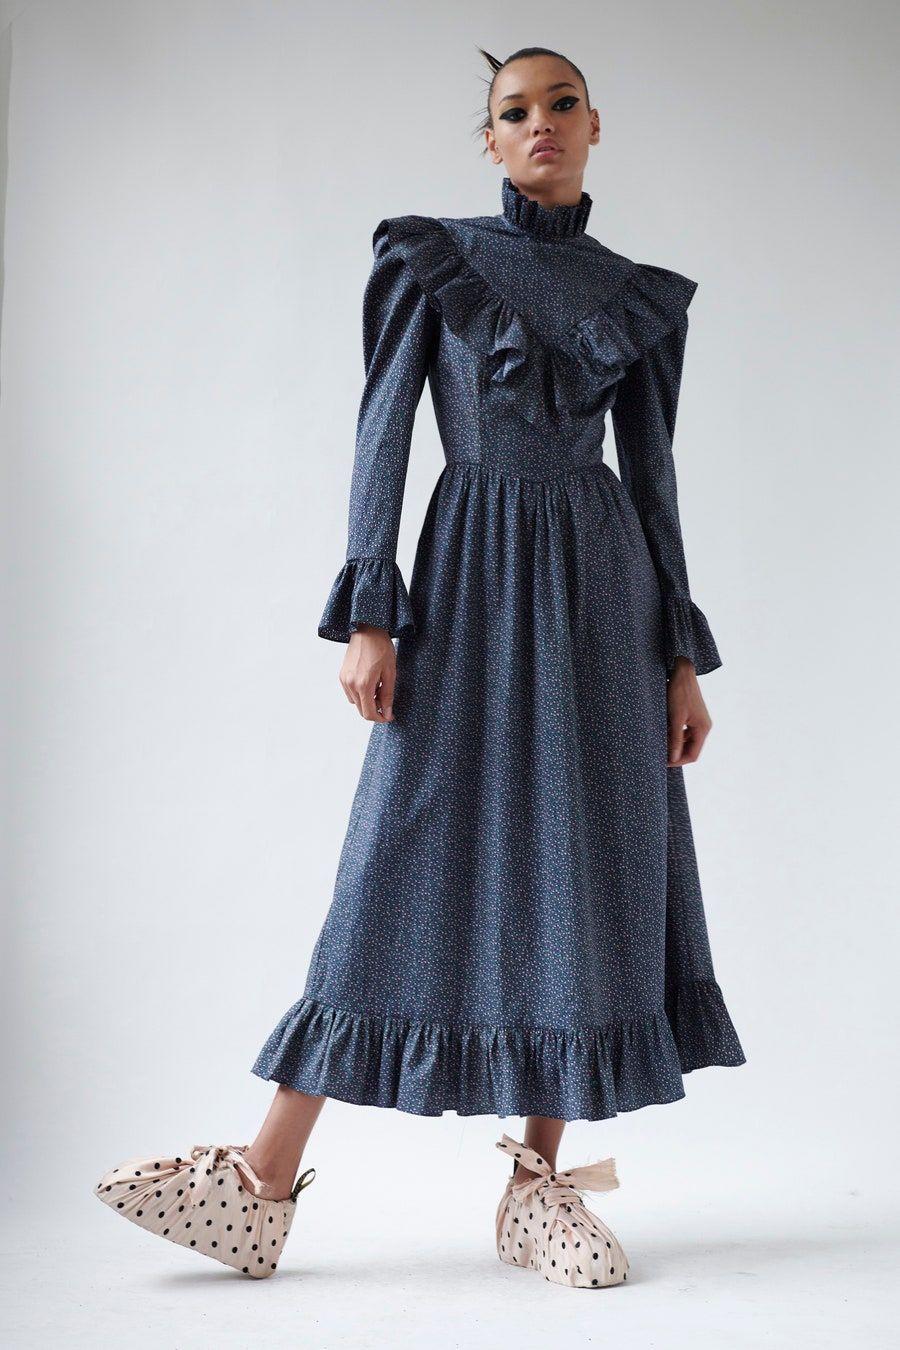 Batsheva Spring 8 Ready-to-Wear Fashion Show  Eclectic fashion